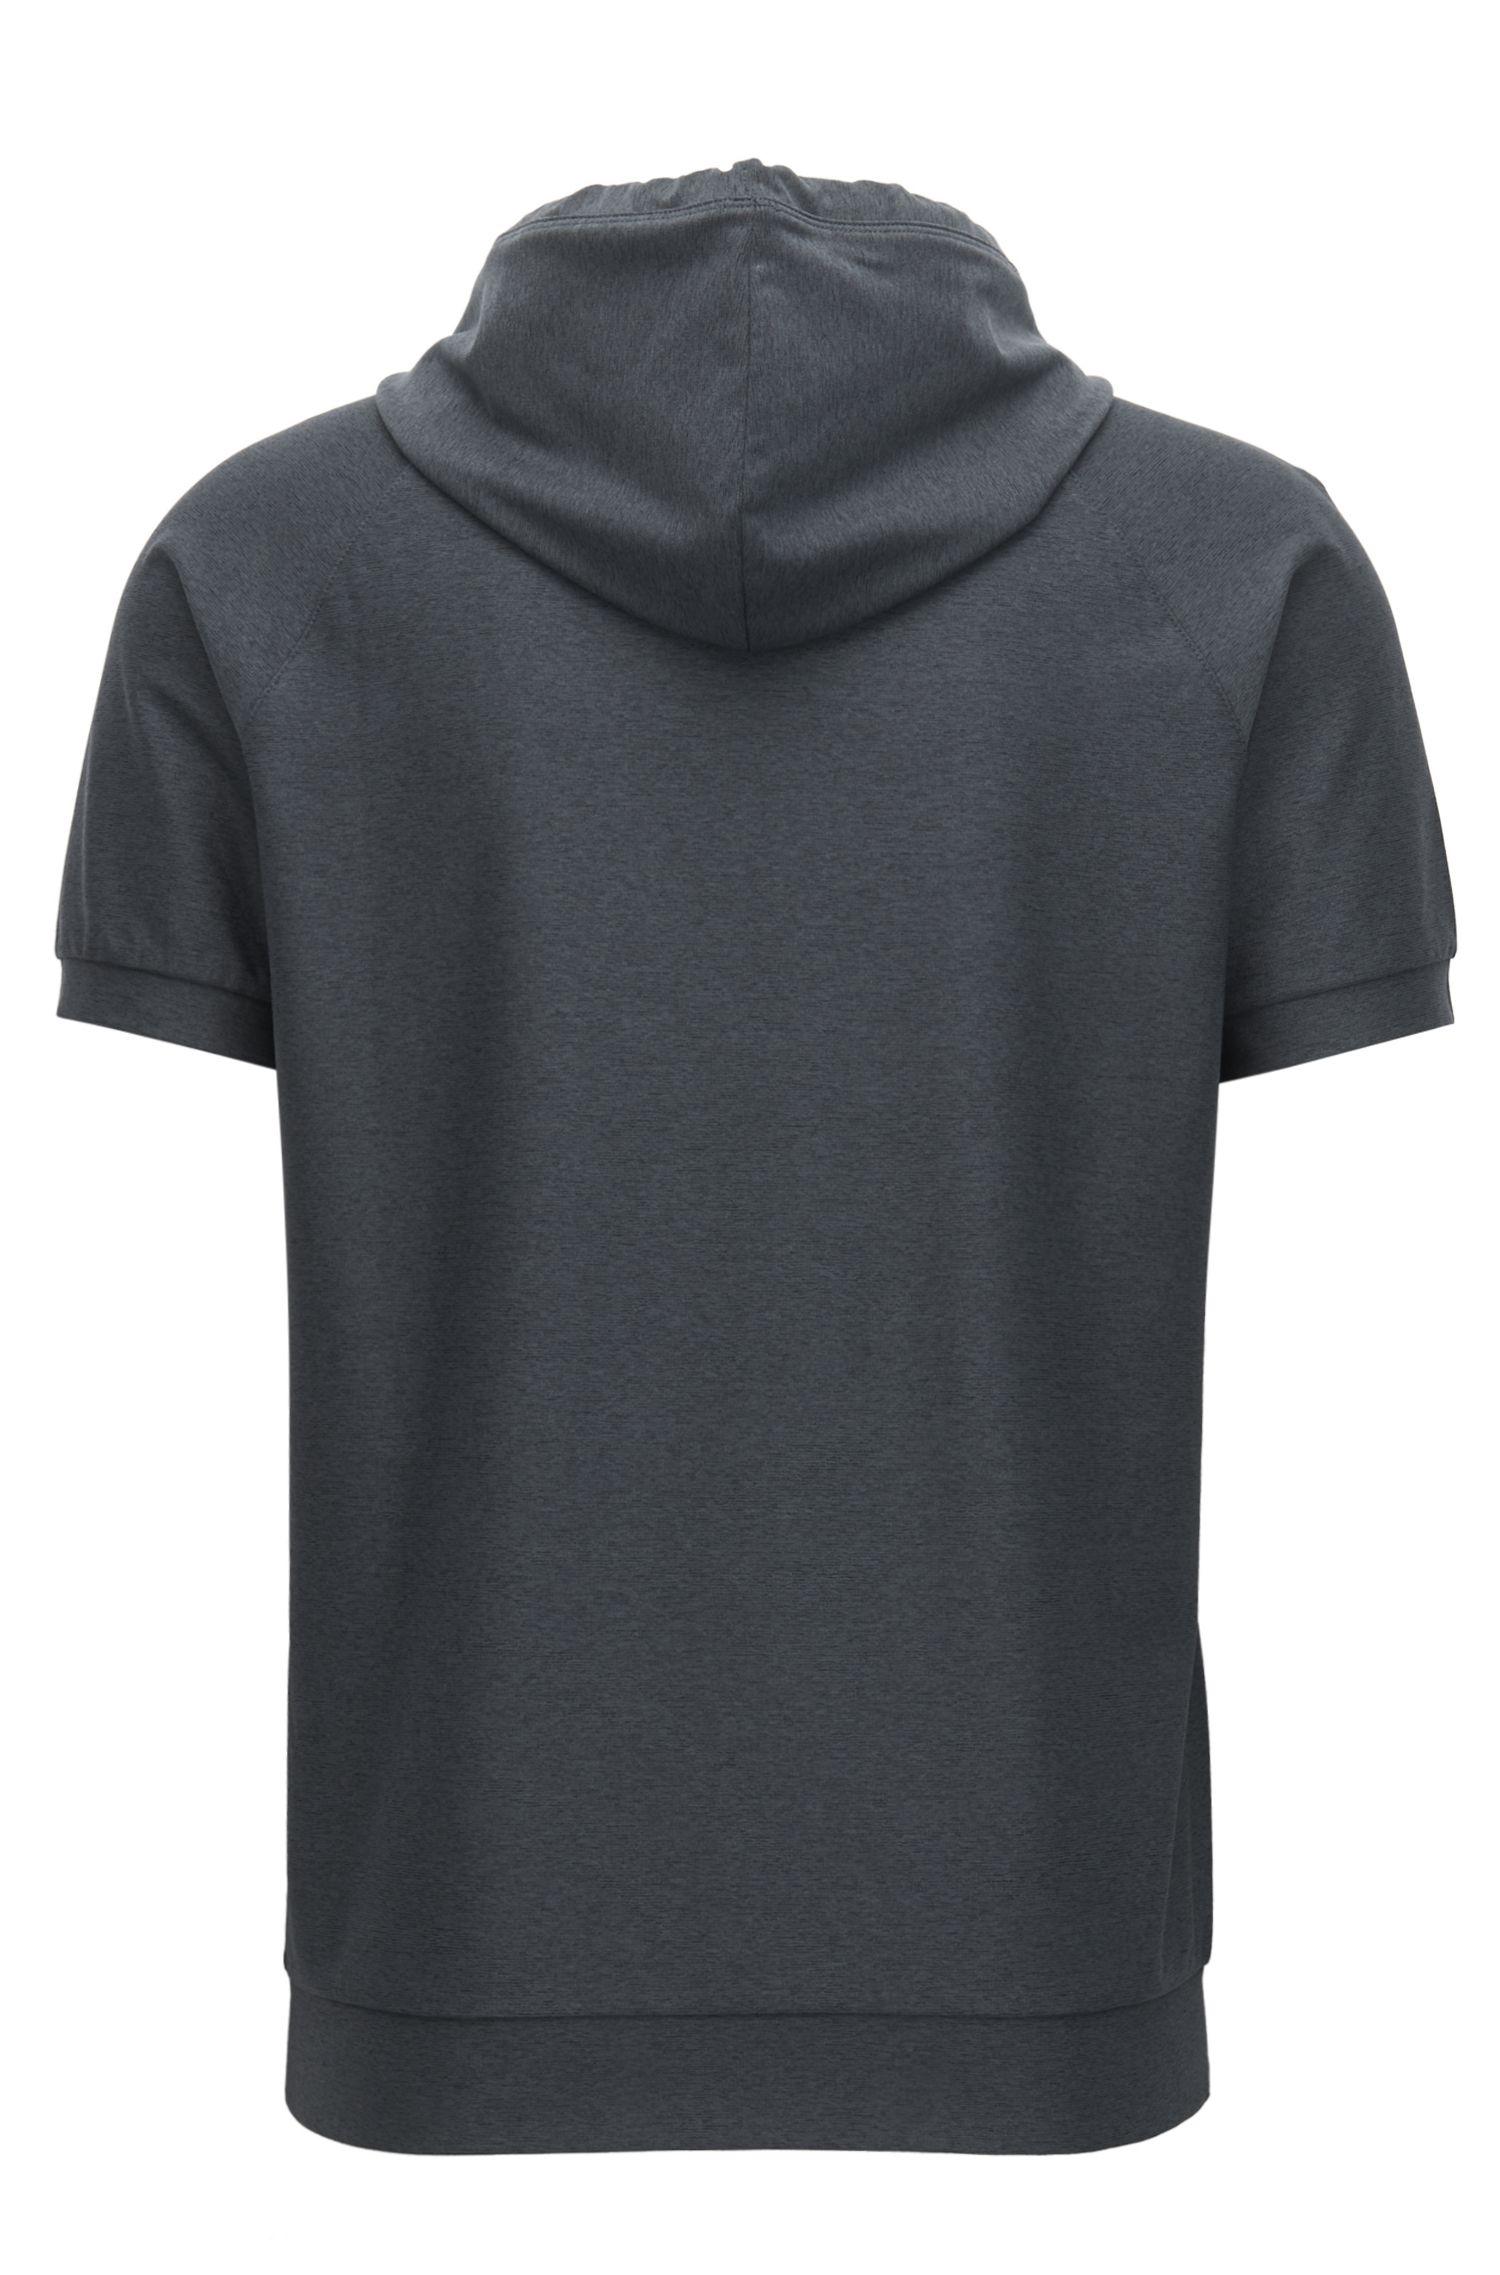 Kapuzen-Pullover aus Material-Mix mit kurzen Ärmeln